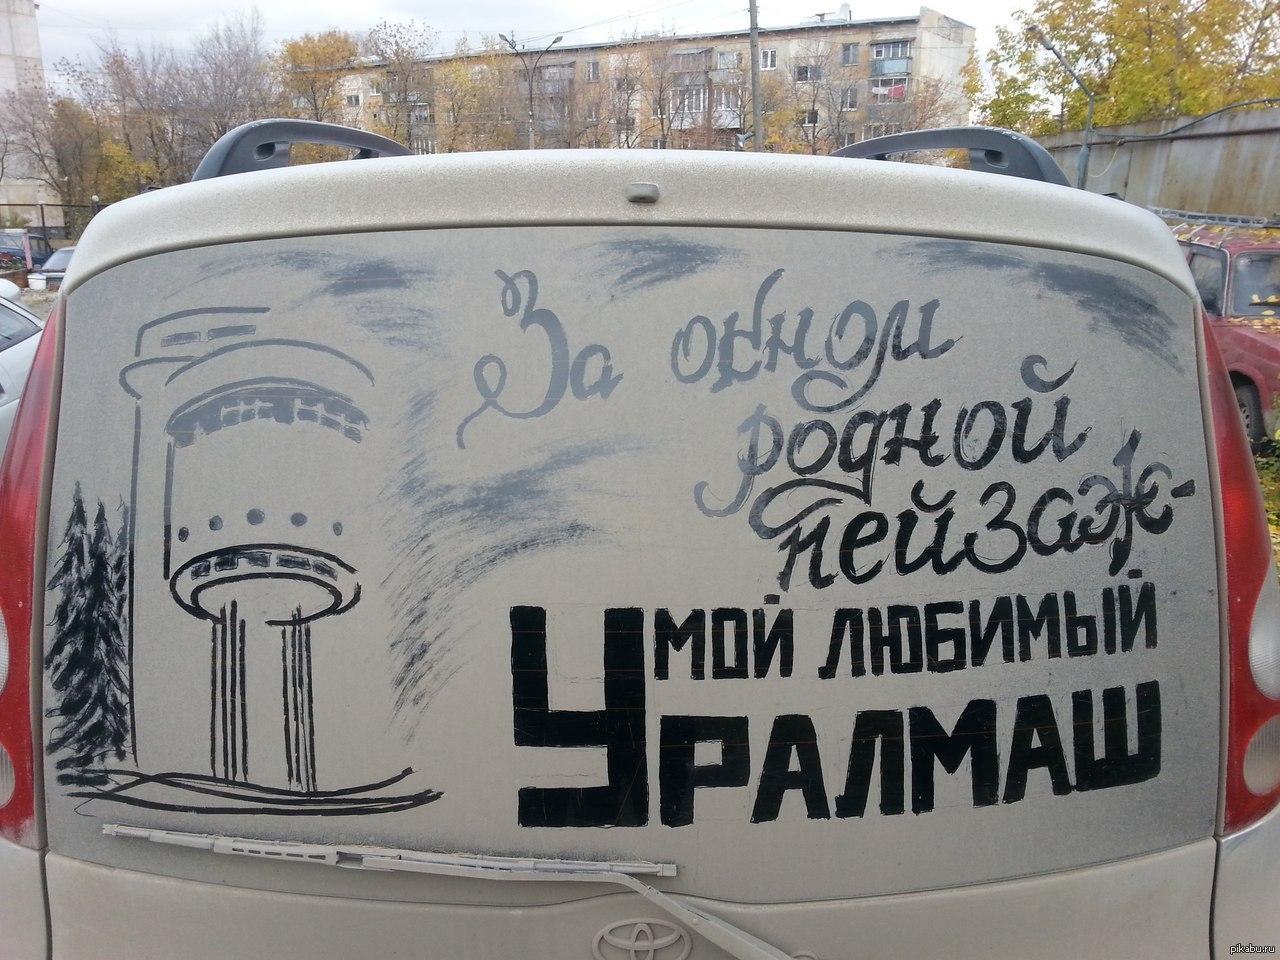 Картинка смешных екатеринбурга